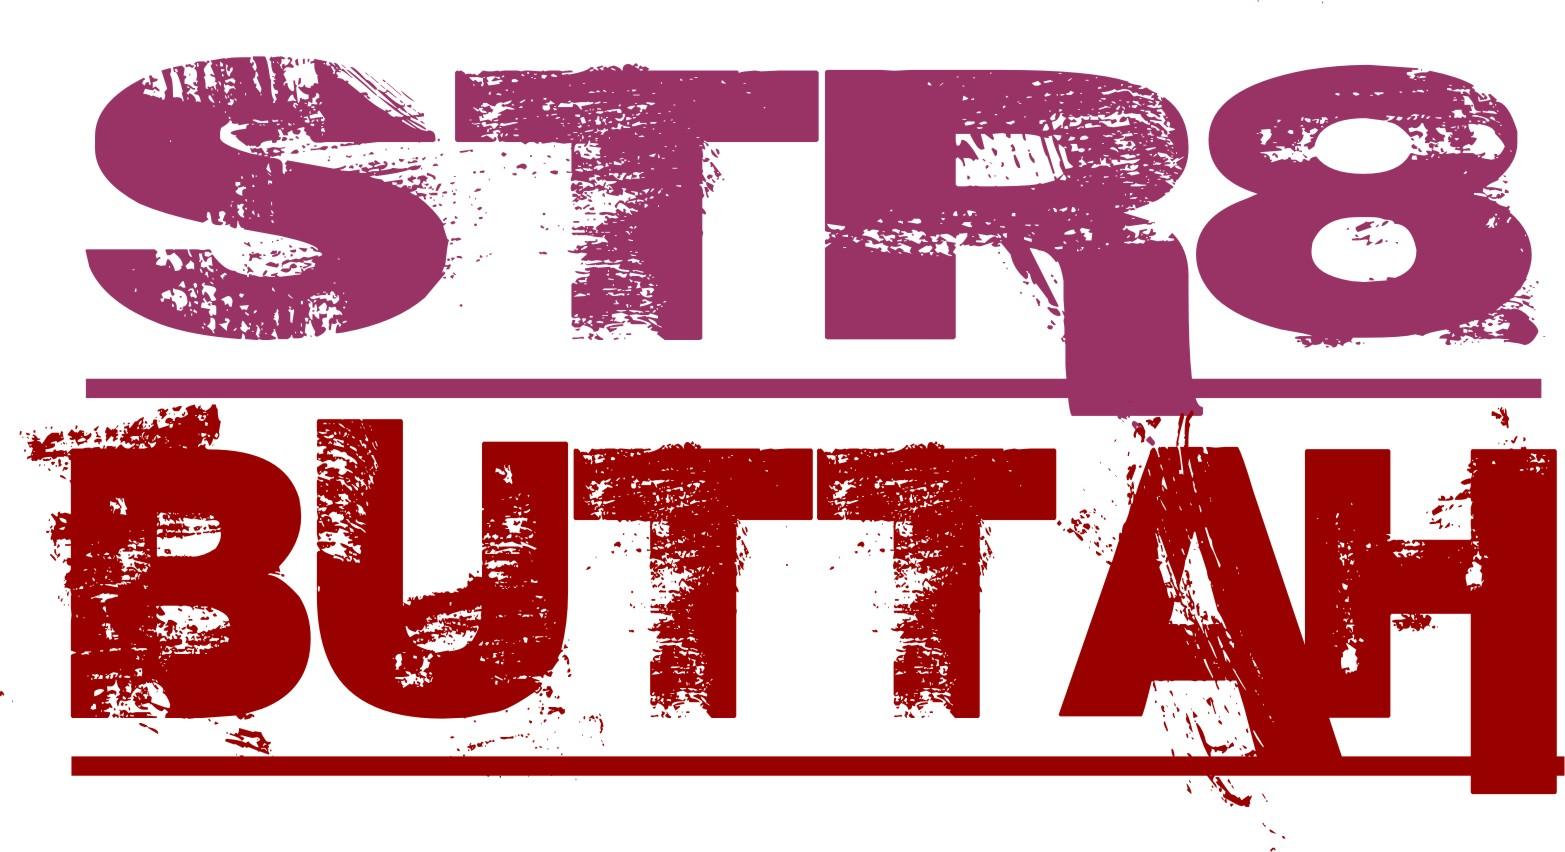 STR8 Buttah